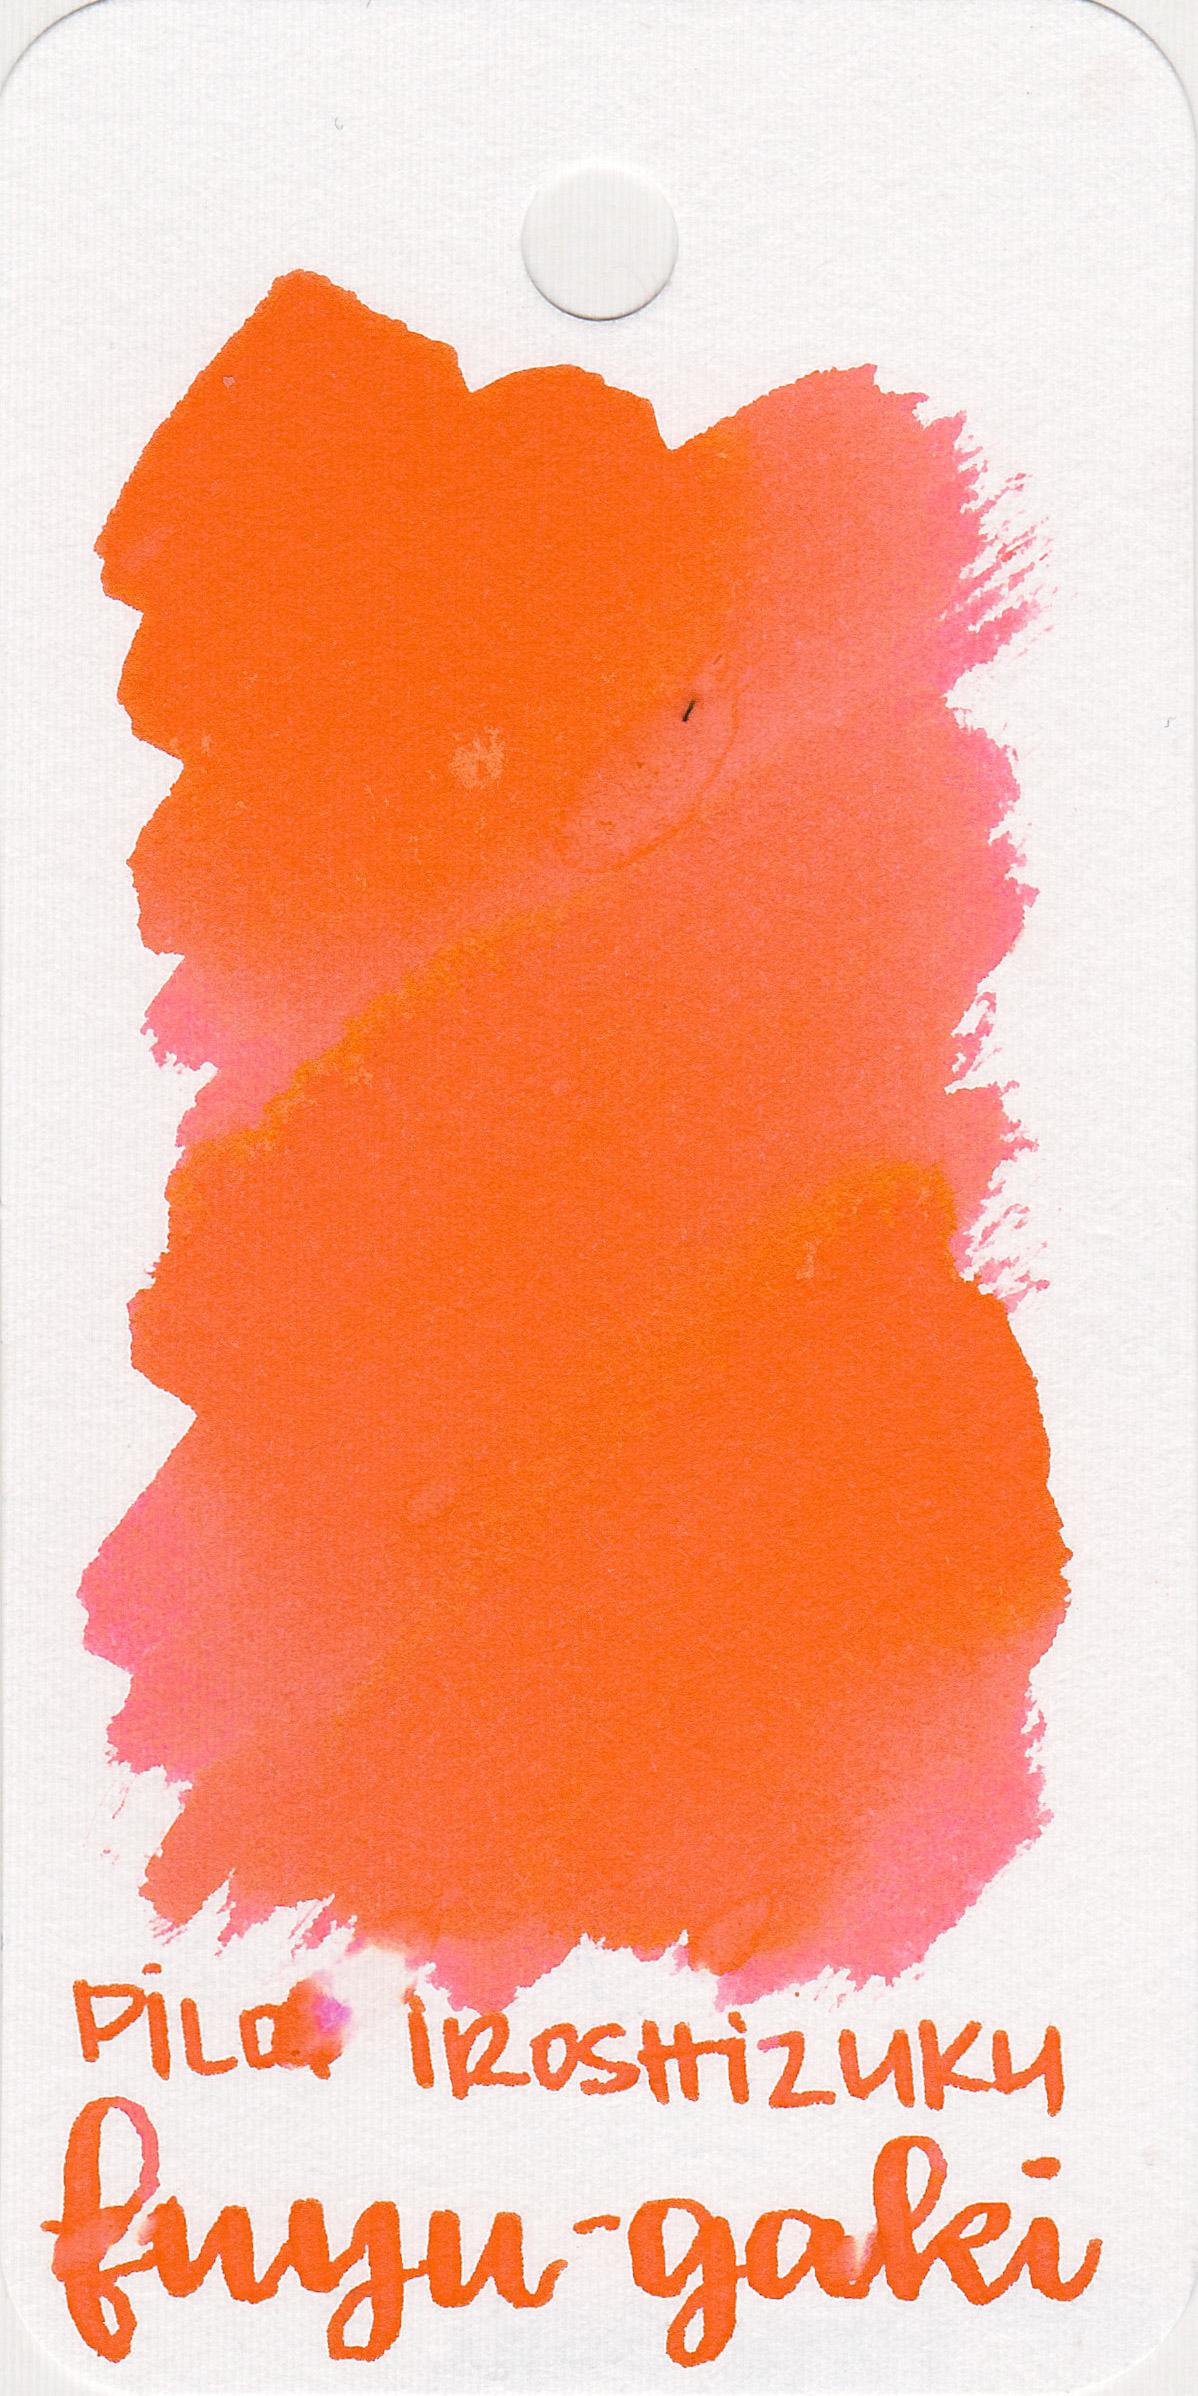 The color: - Fuyu-gaki is a bright red-orange.